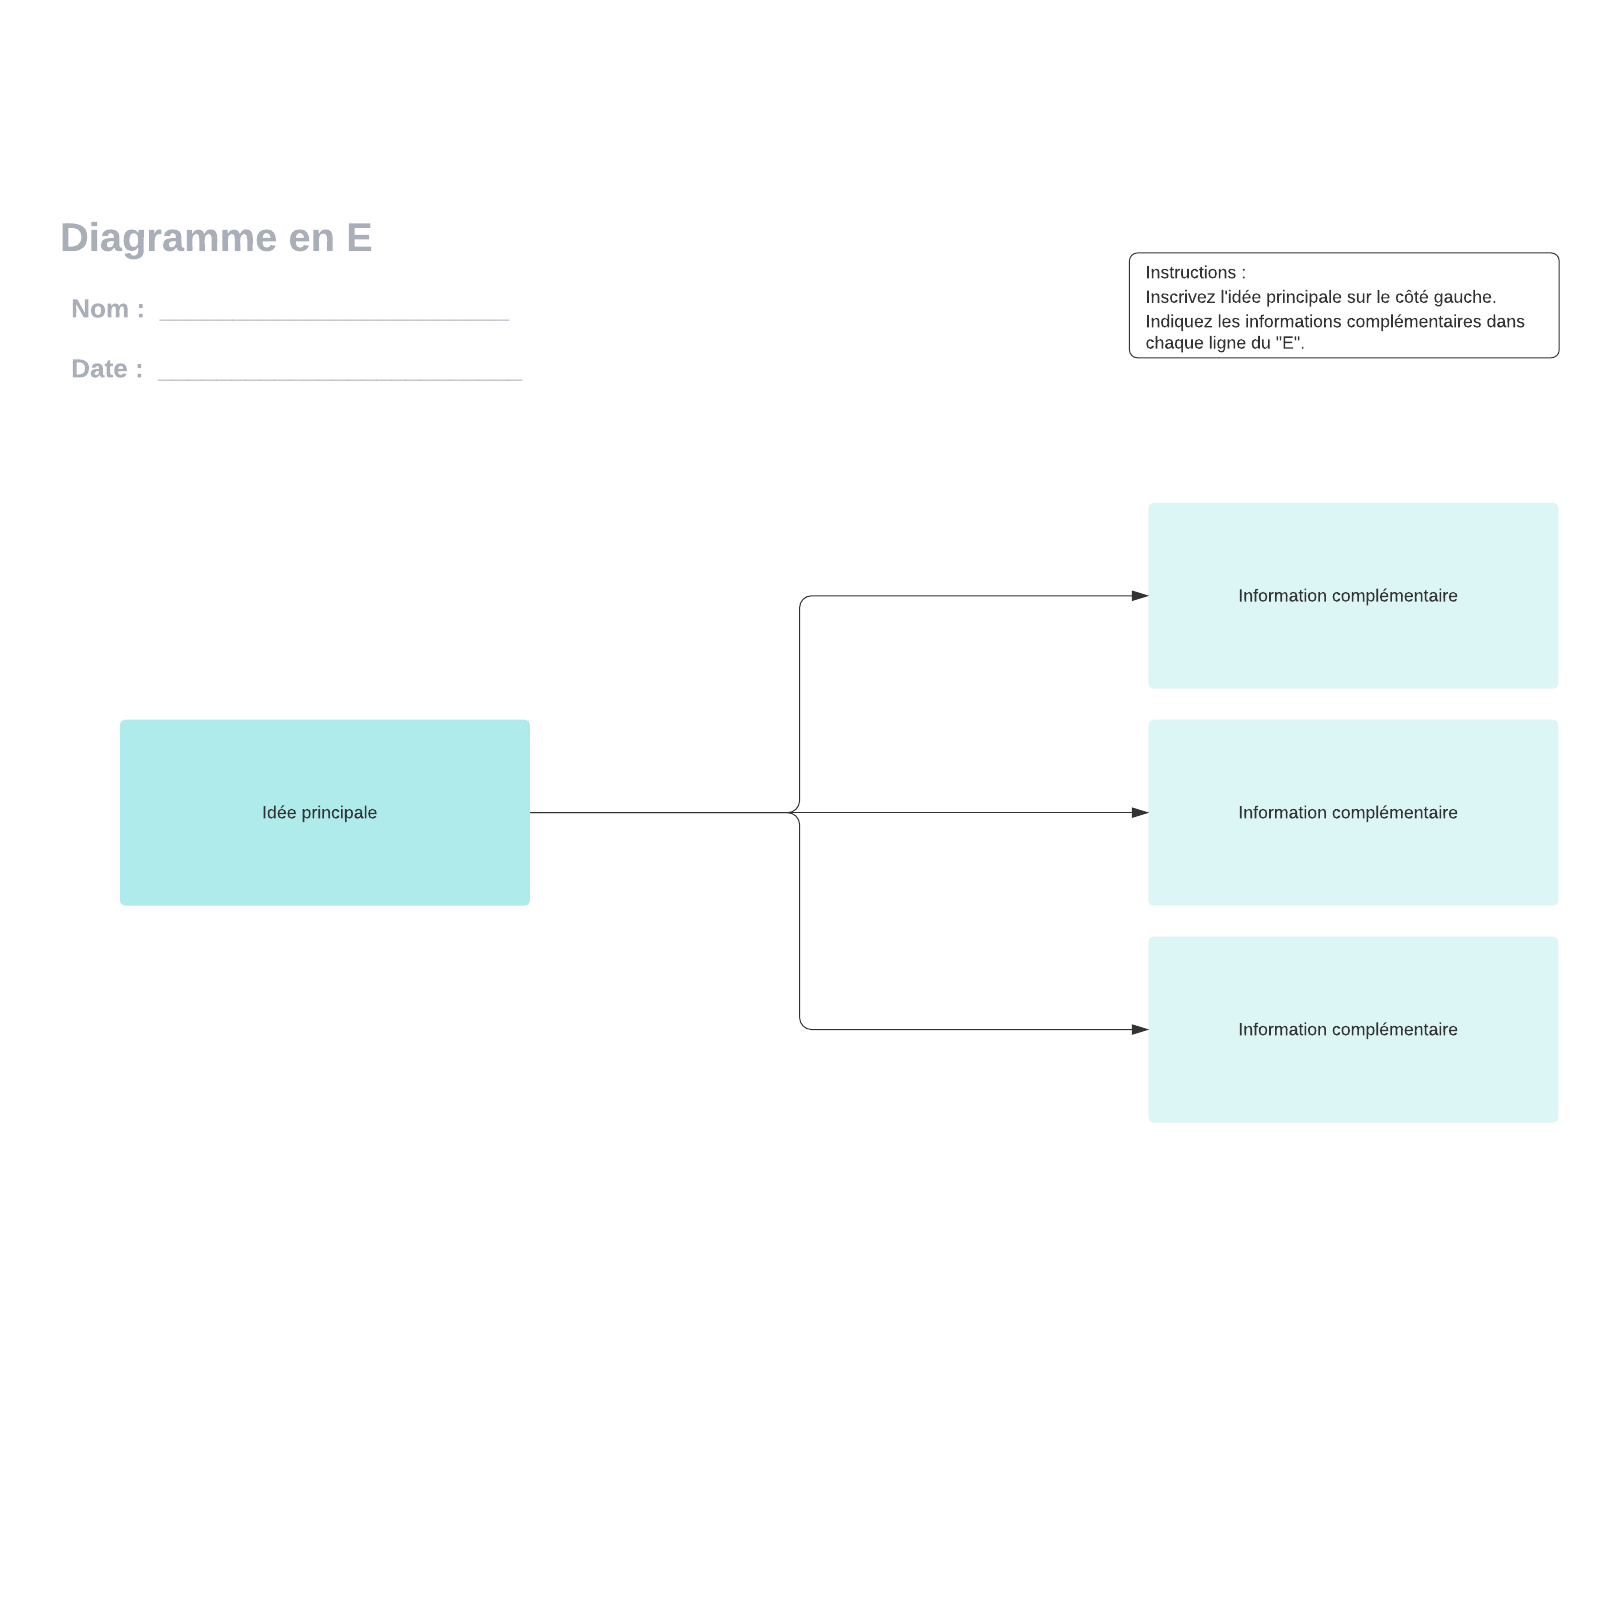 exemple de diagramme en E (3 branches) vierge